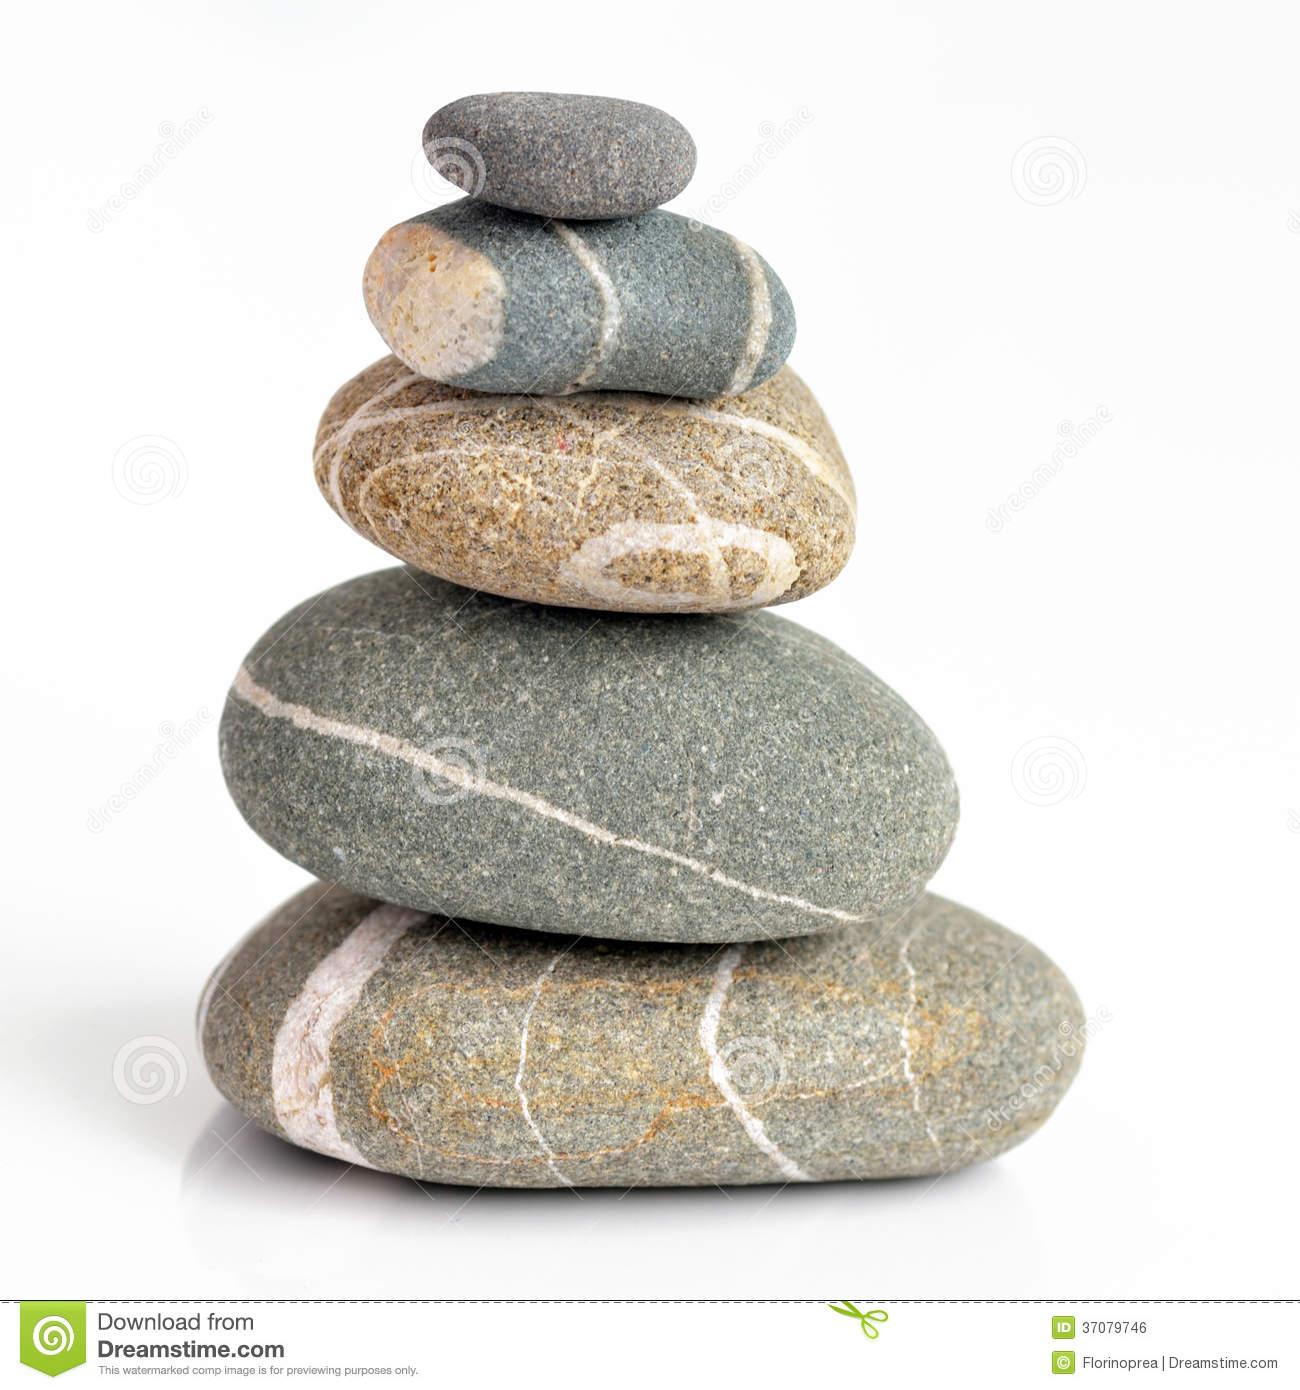 Scatter stones clipart graphic transparent download Stone stack clipart 20 free Cliparts   Download images on ... graphic transparent download